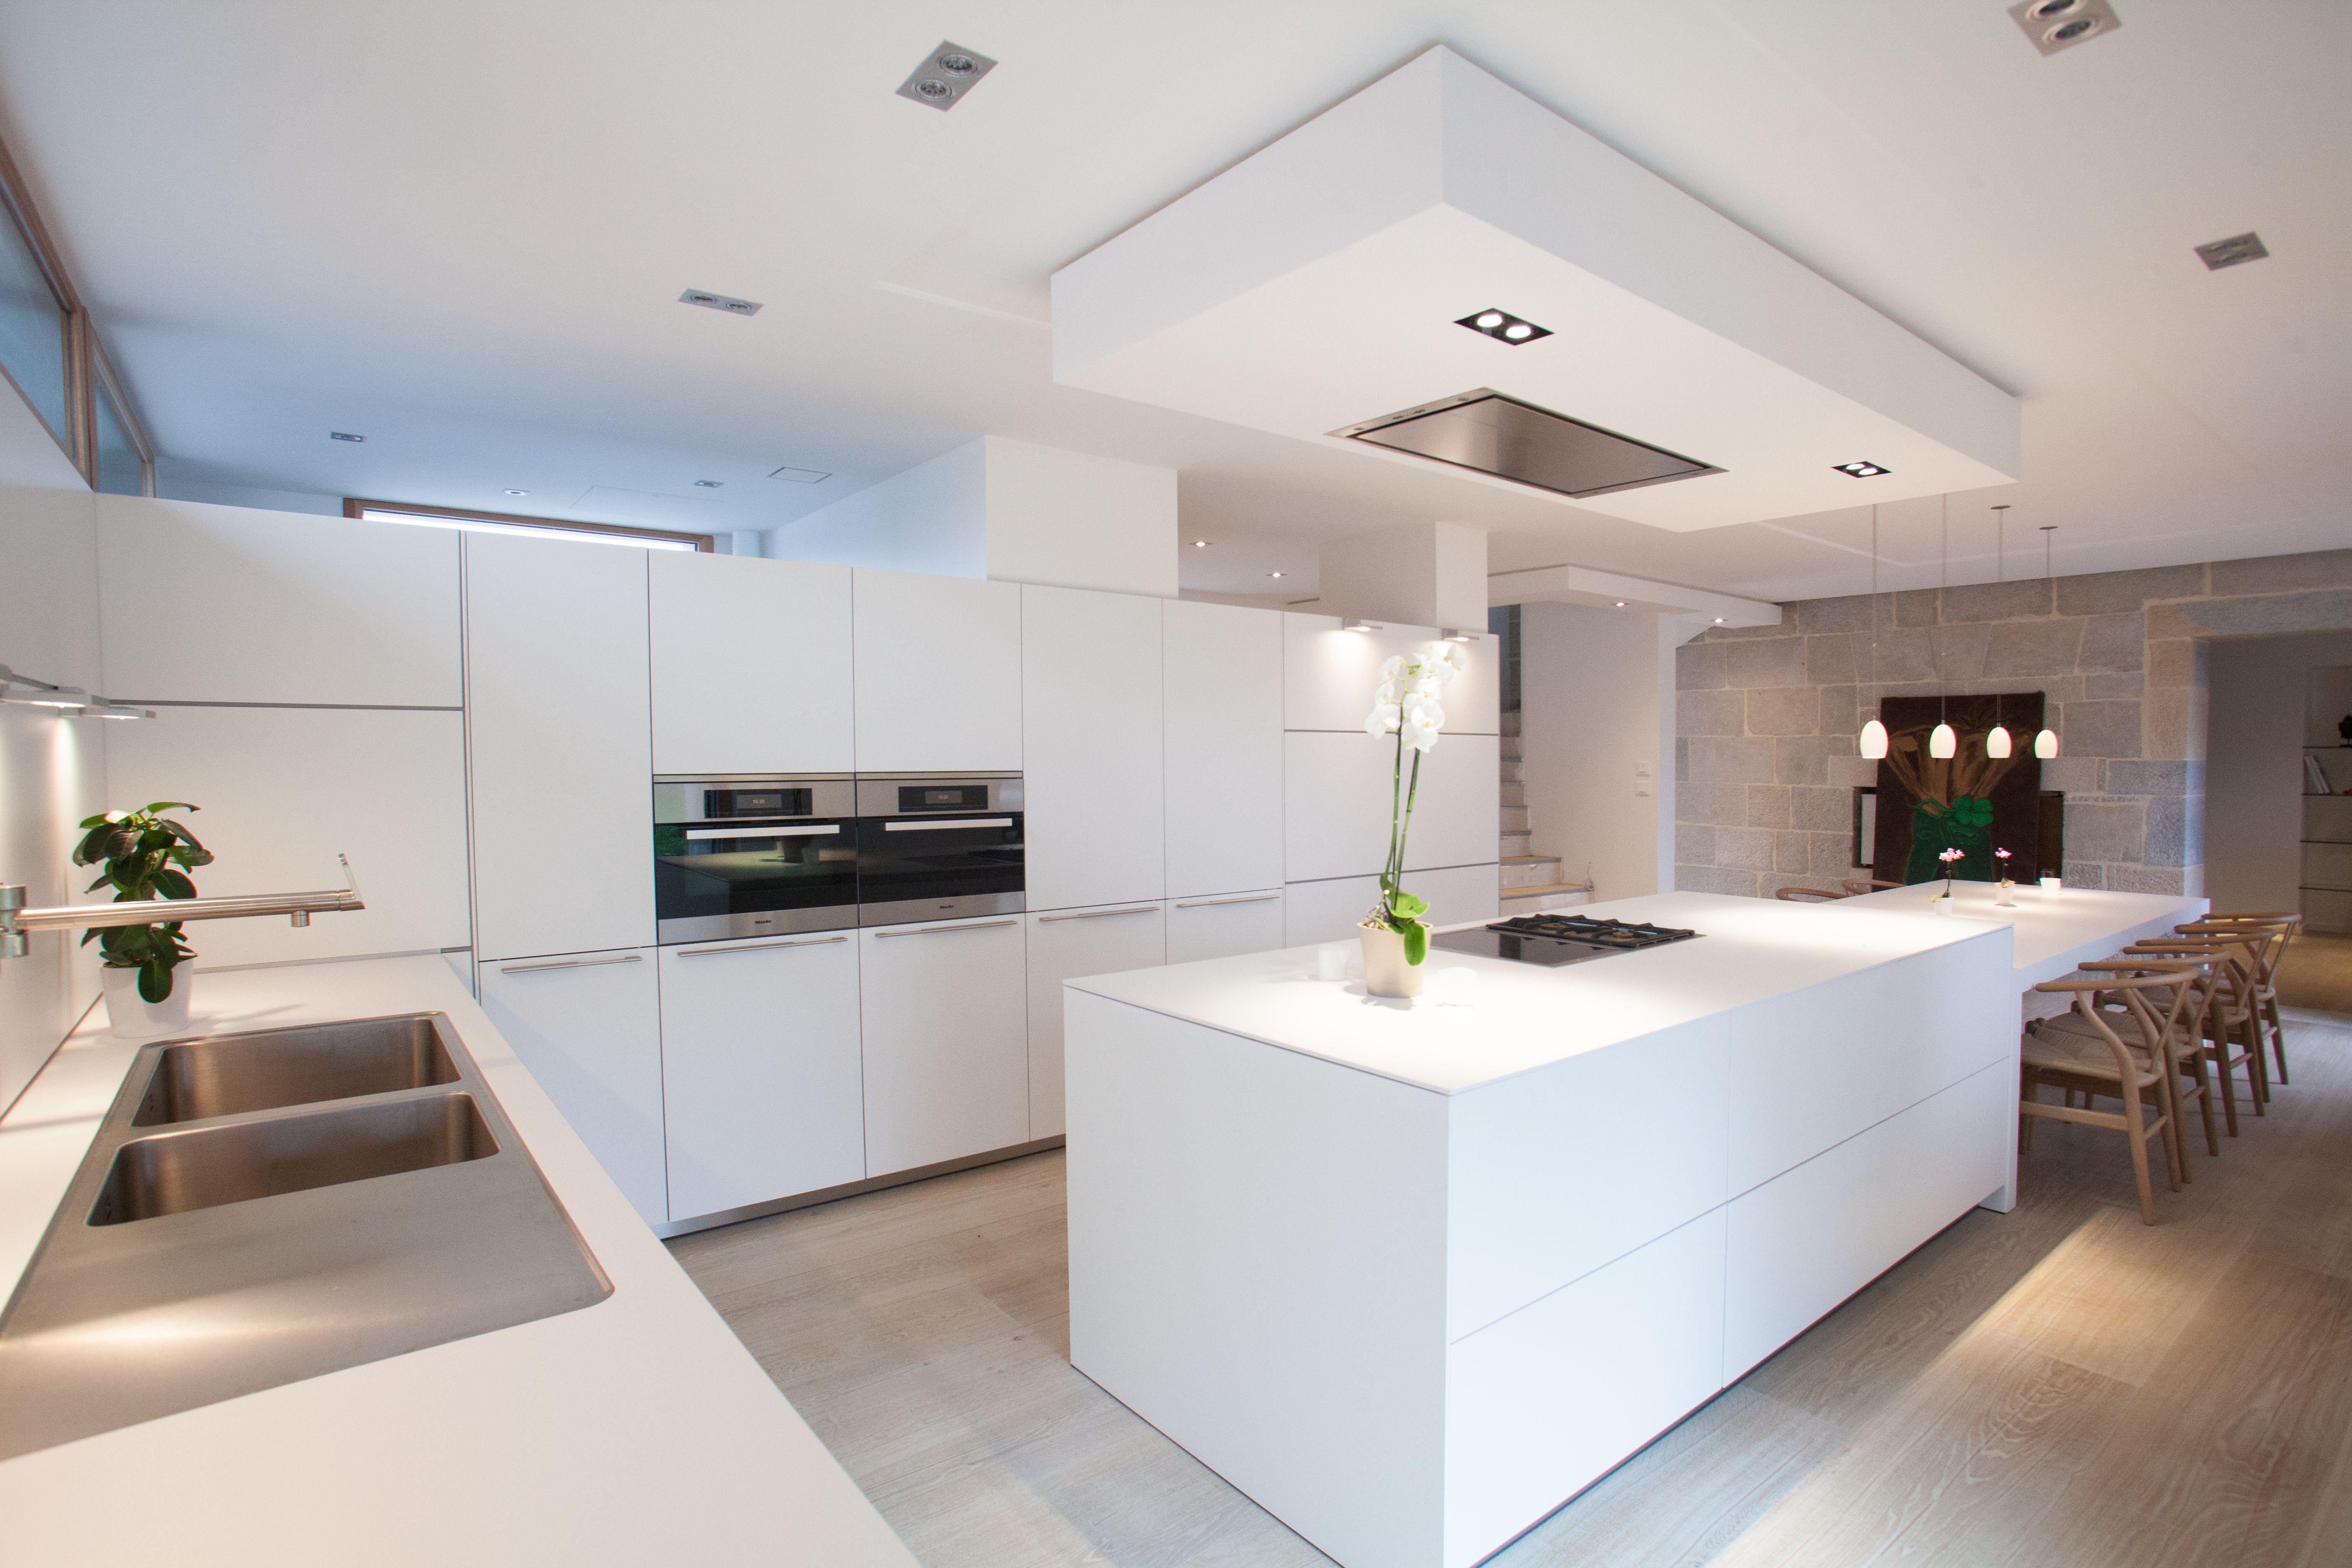 Cuisine bulthaup b3 stratifi blanc alpin cuisine - Bulthaup beton ...